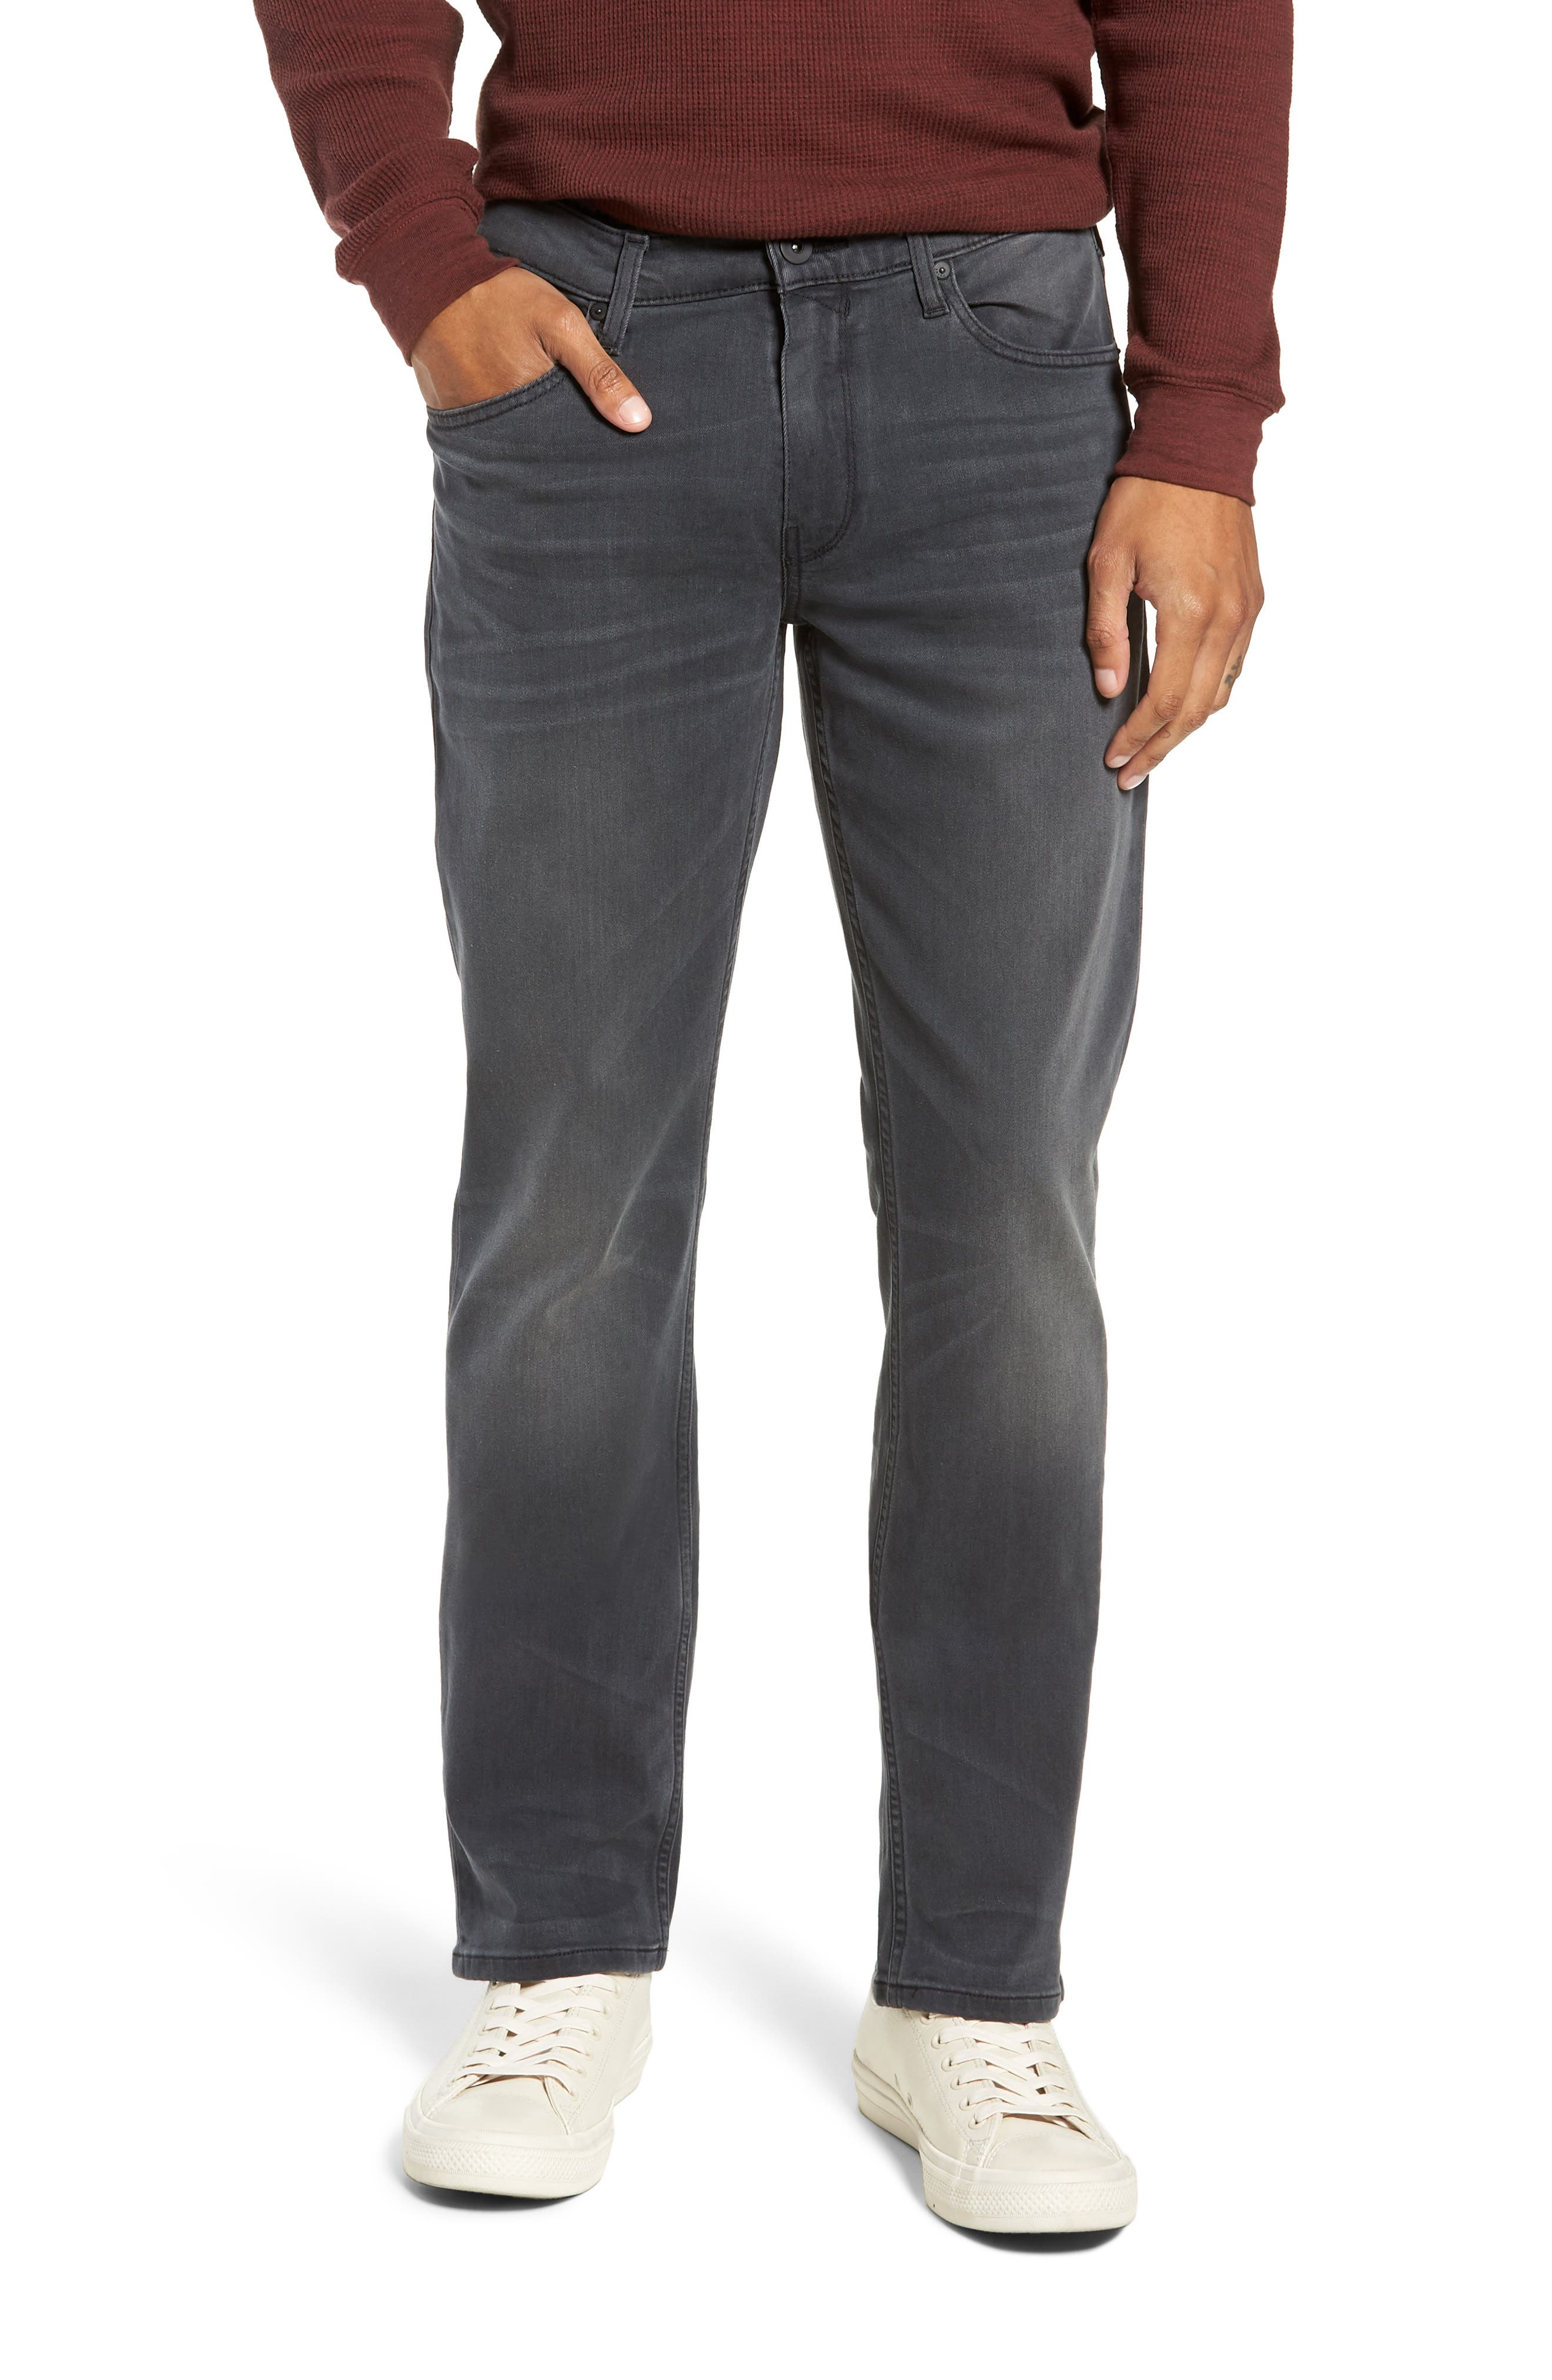 Transcend - Federal Slim Straight Leg Jeans,                             Main thumbnail 1, color,                             SHELDON